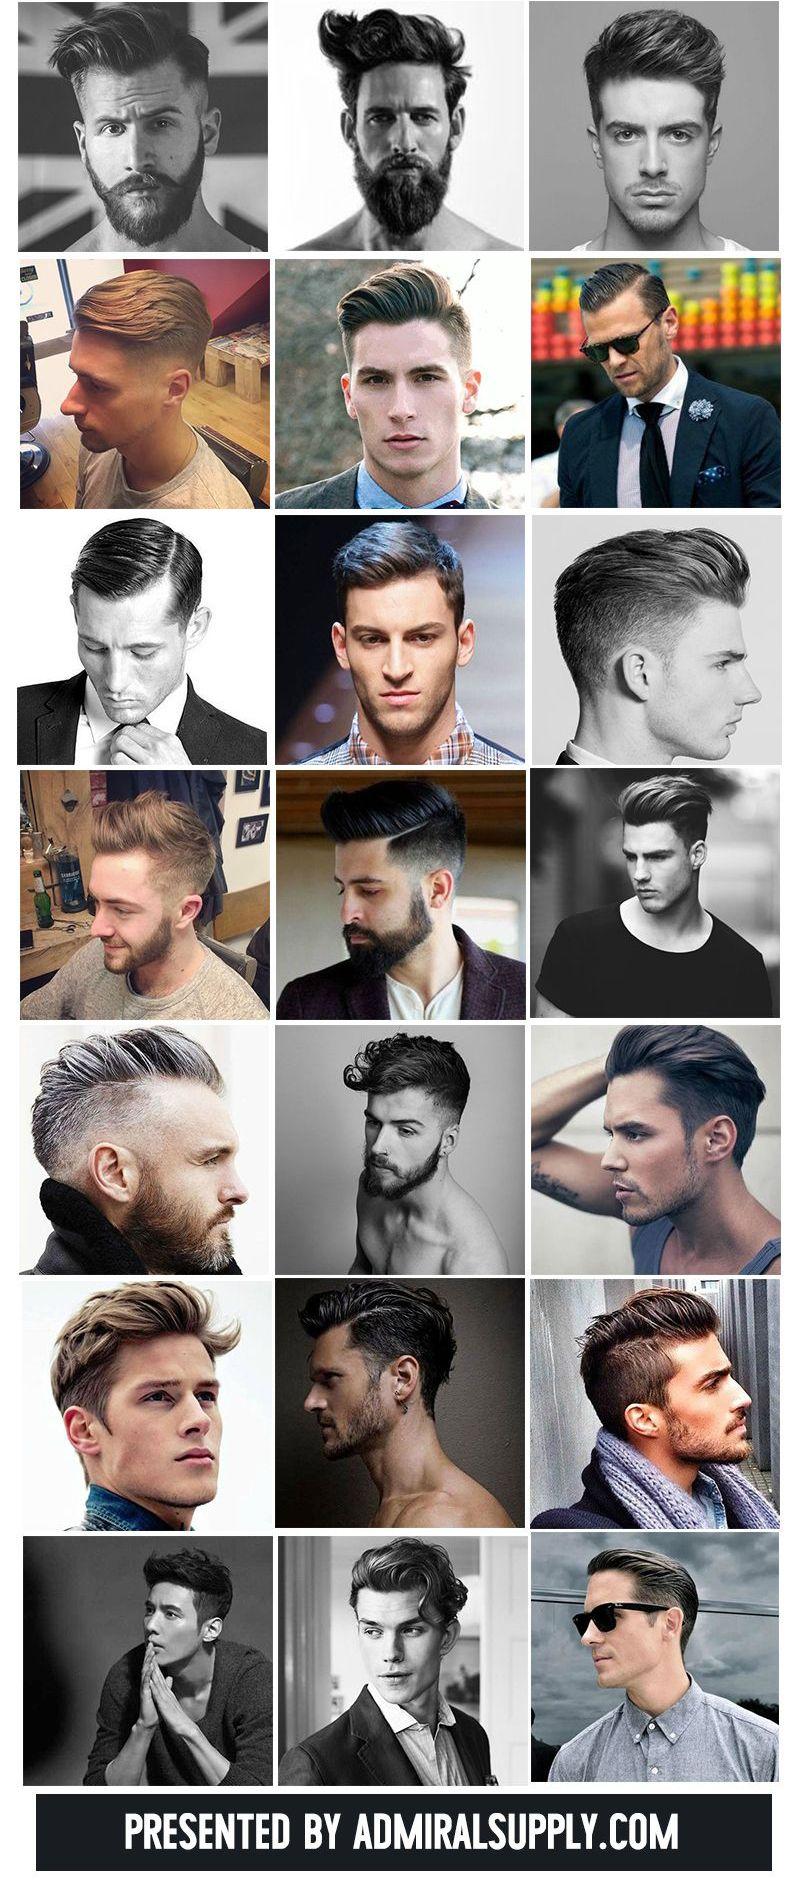 Men haircut style バーバー系の刈り上げヘアスタイル特集  hair style haircuts and